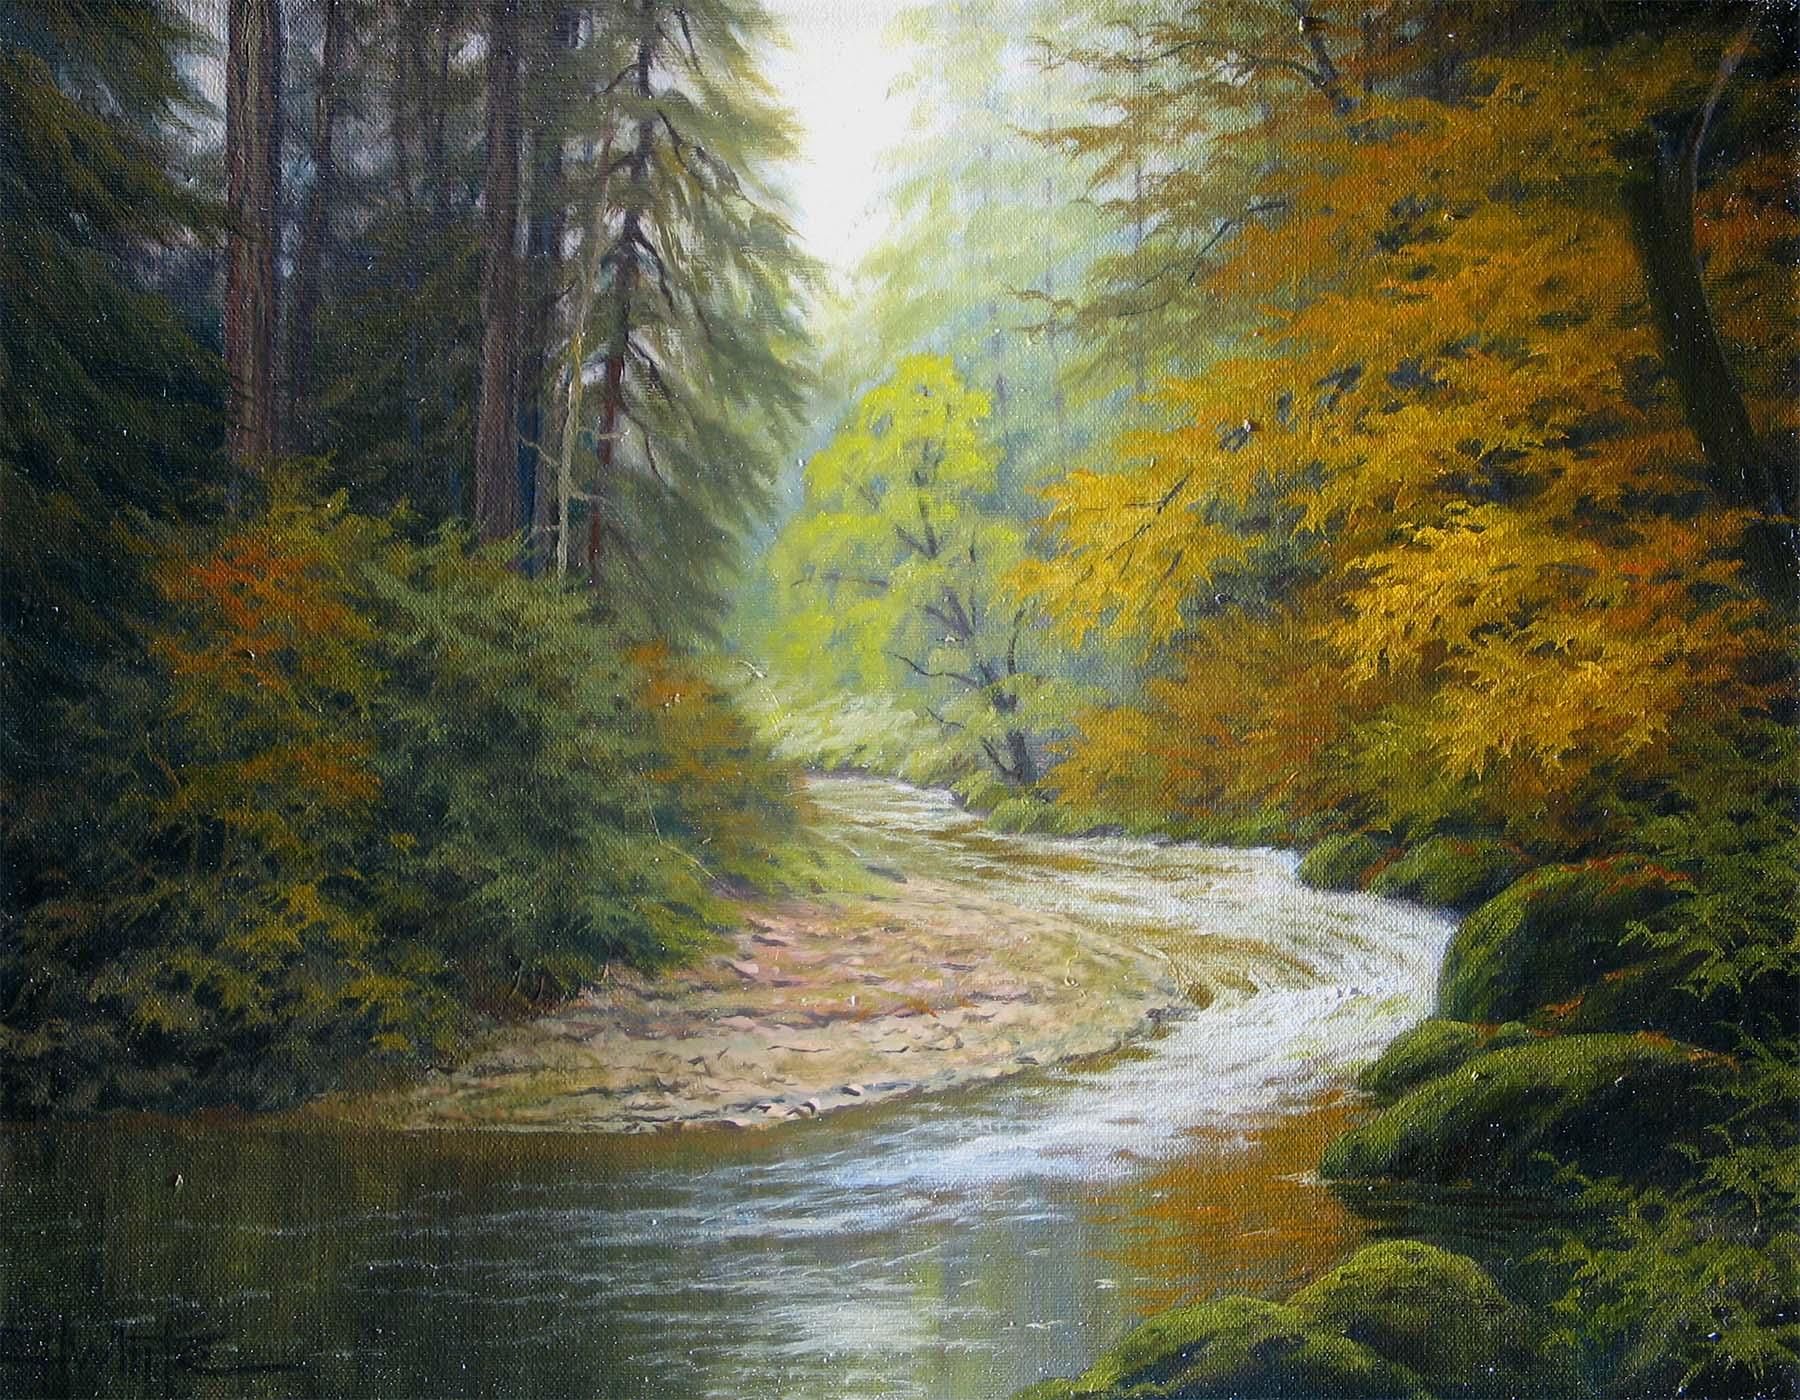 Forest Stream - Charles White